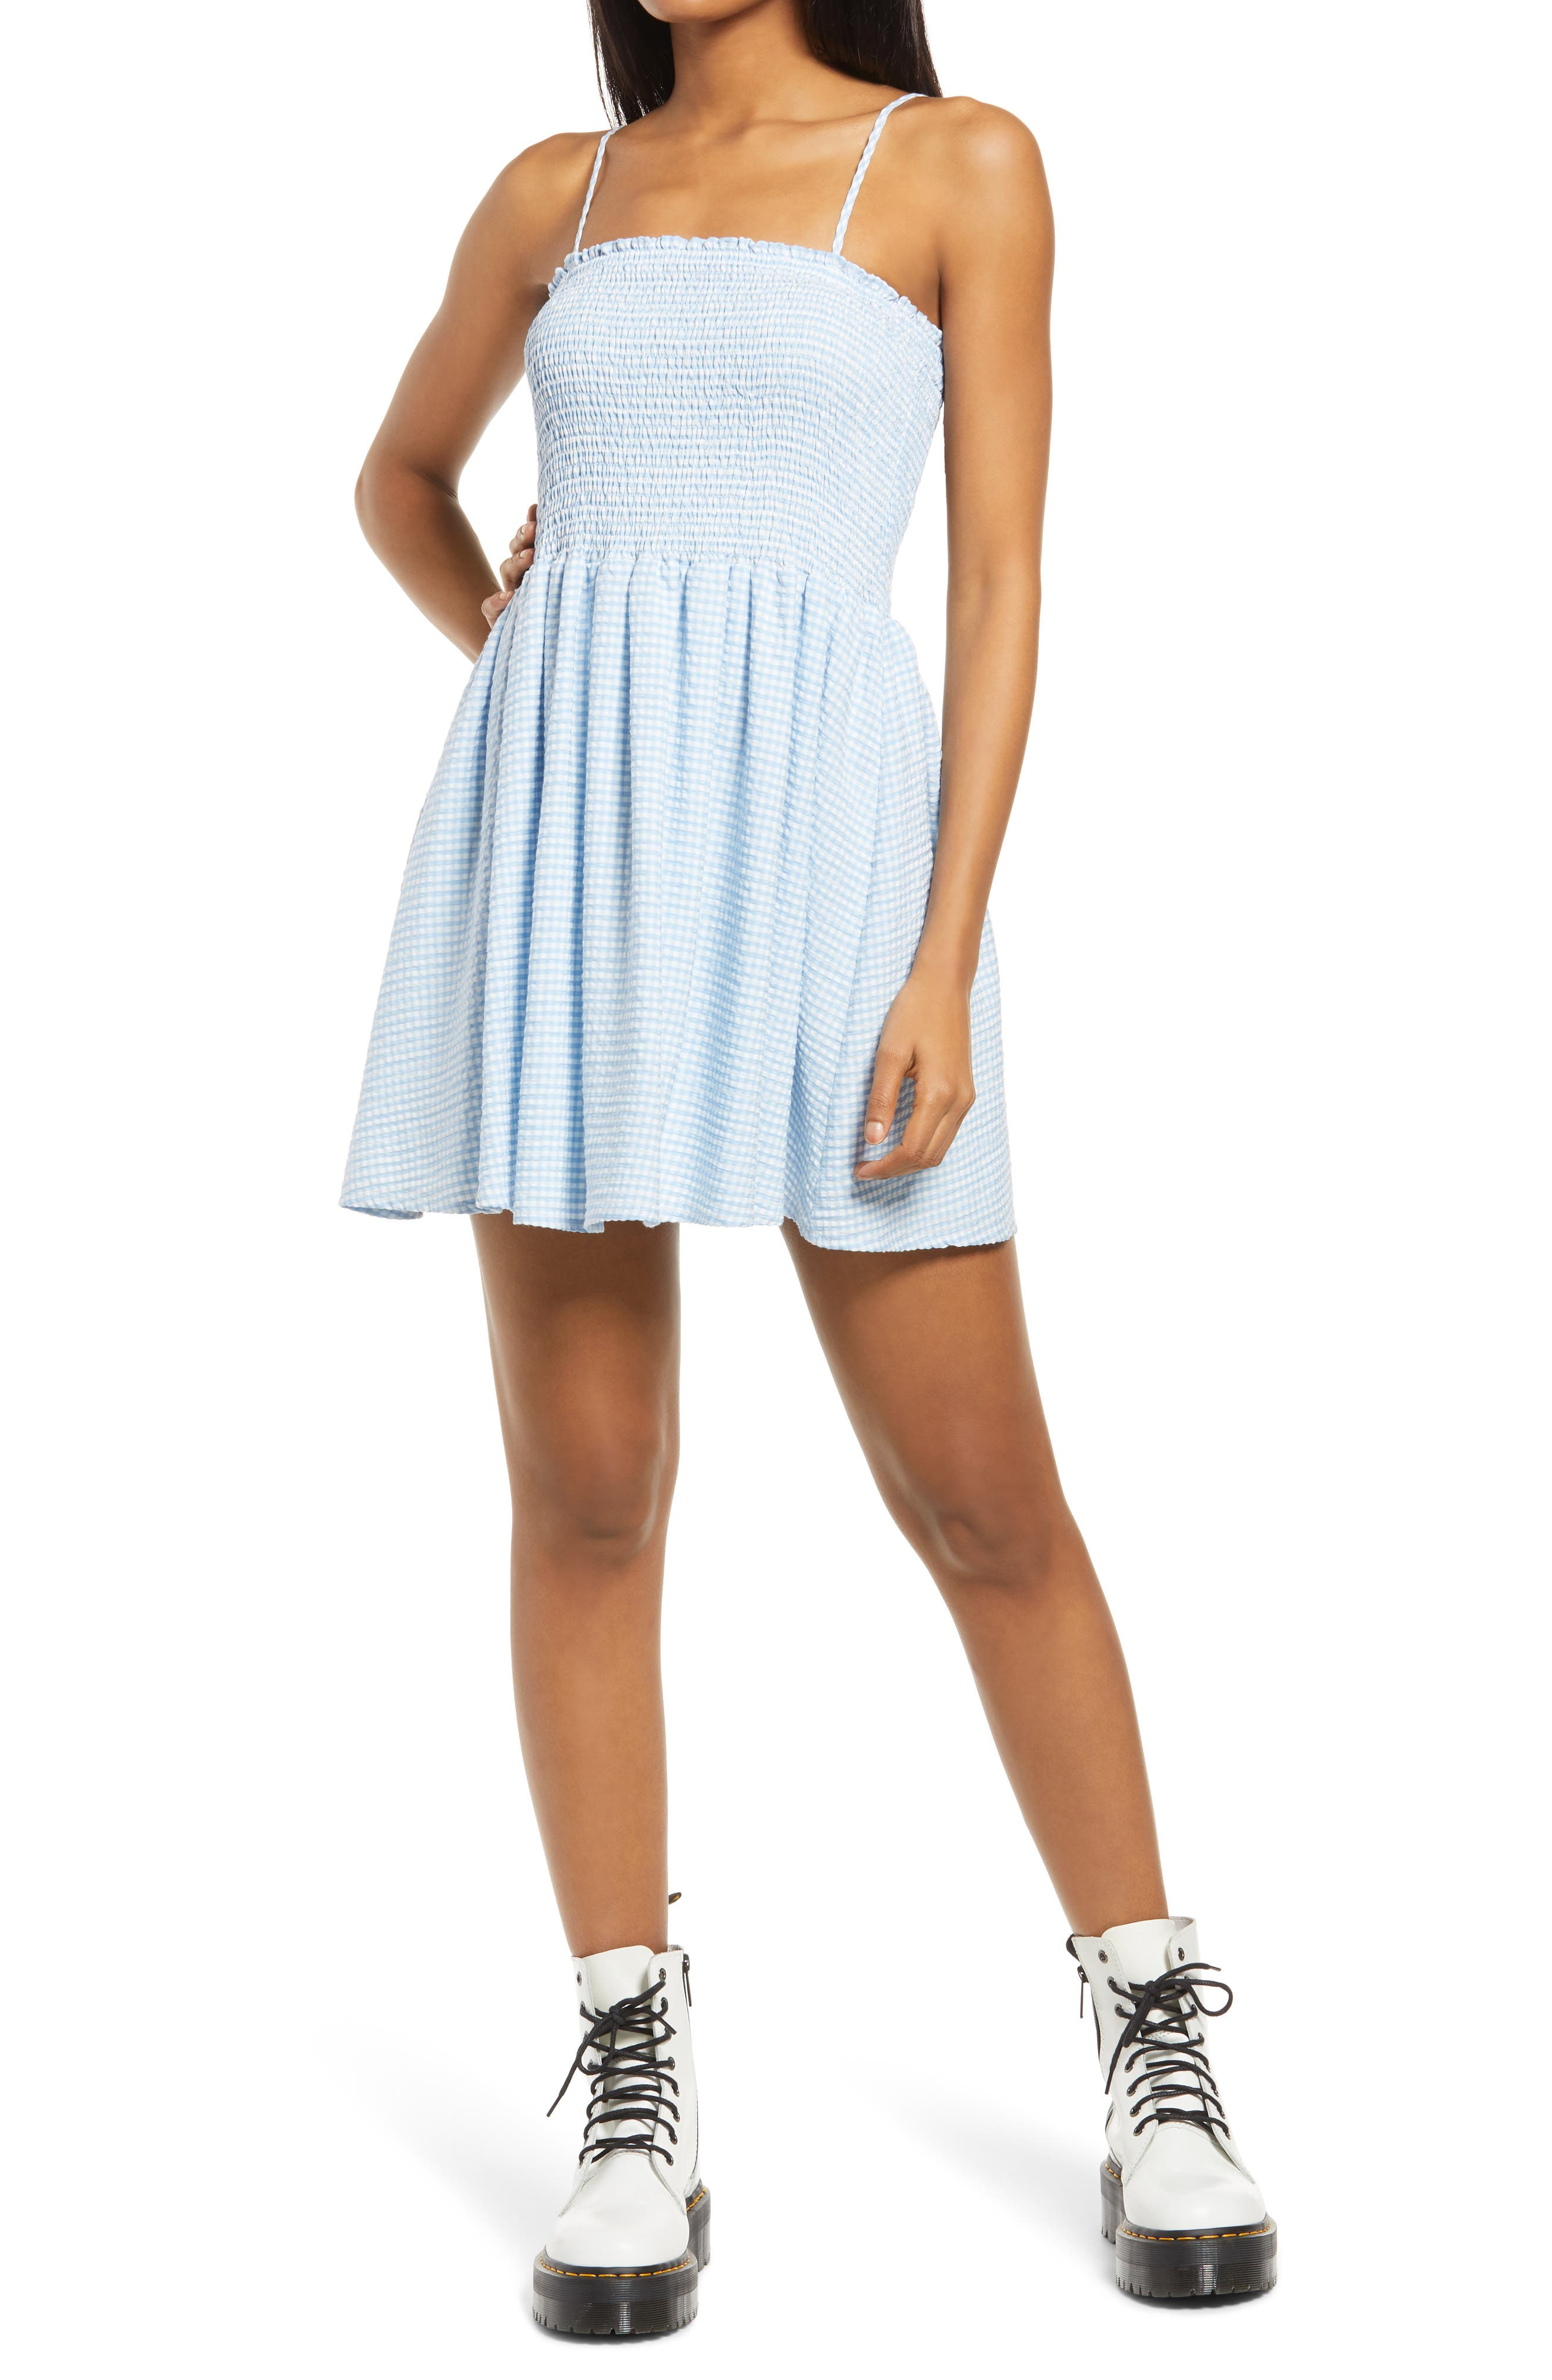 Treat Me Right Gingham Smocked Minidress